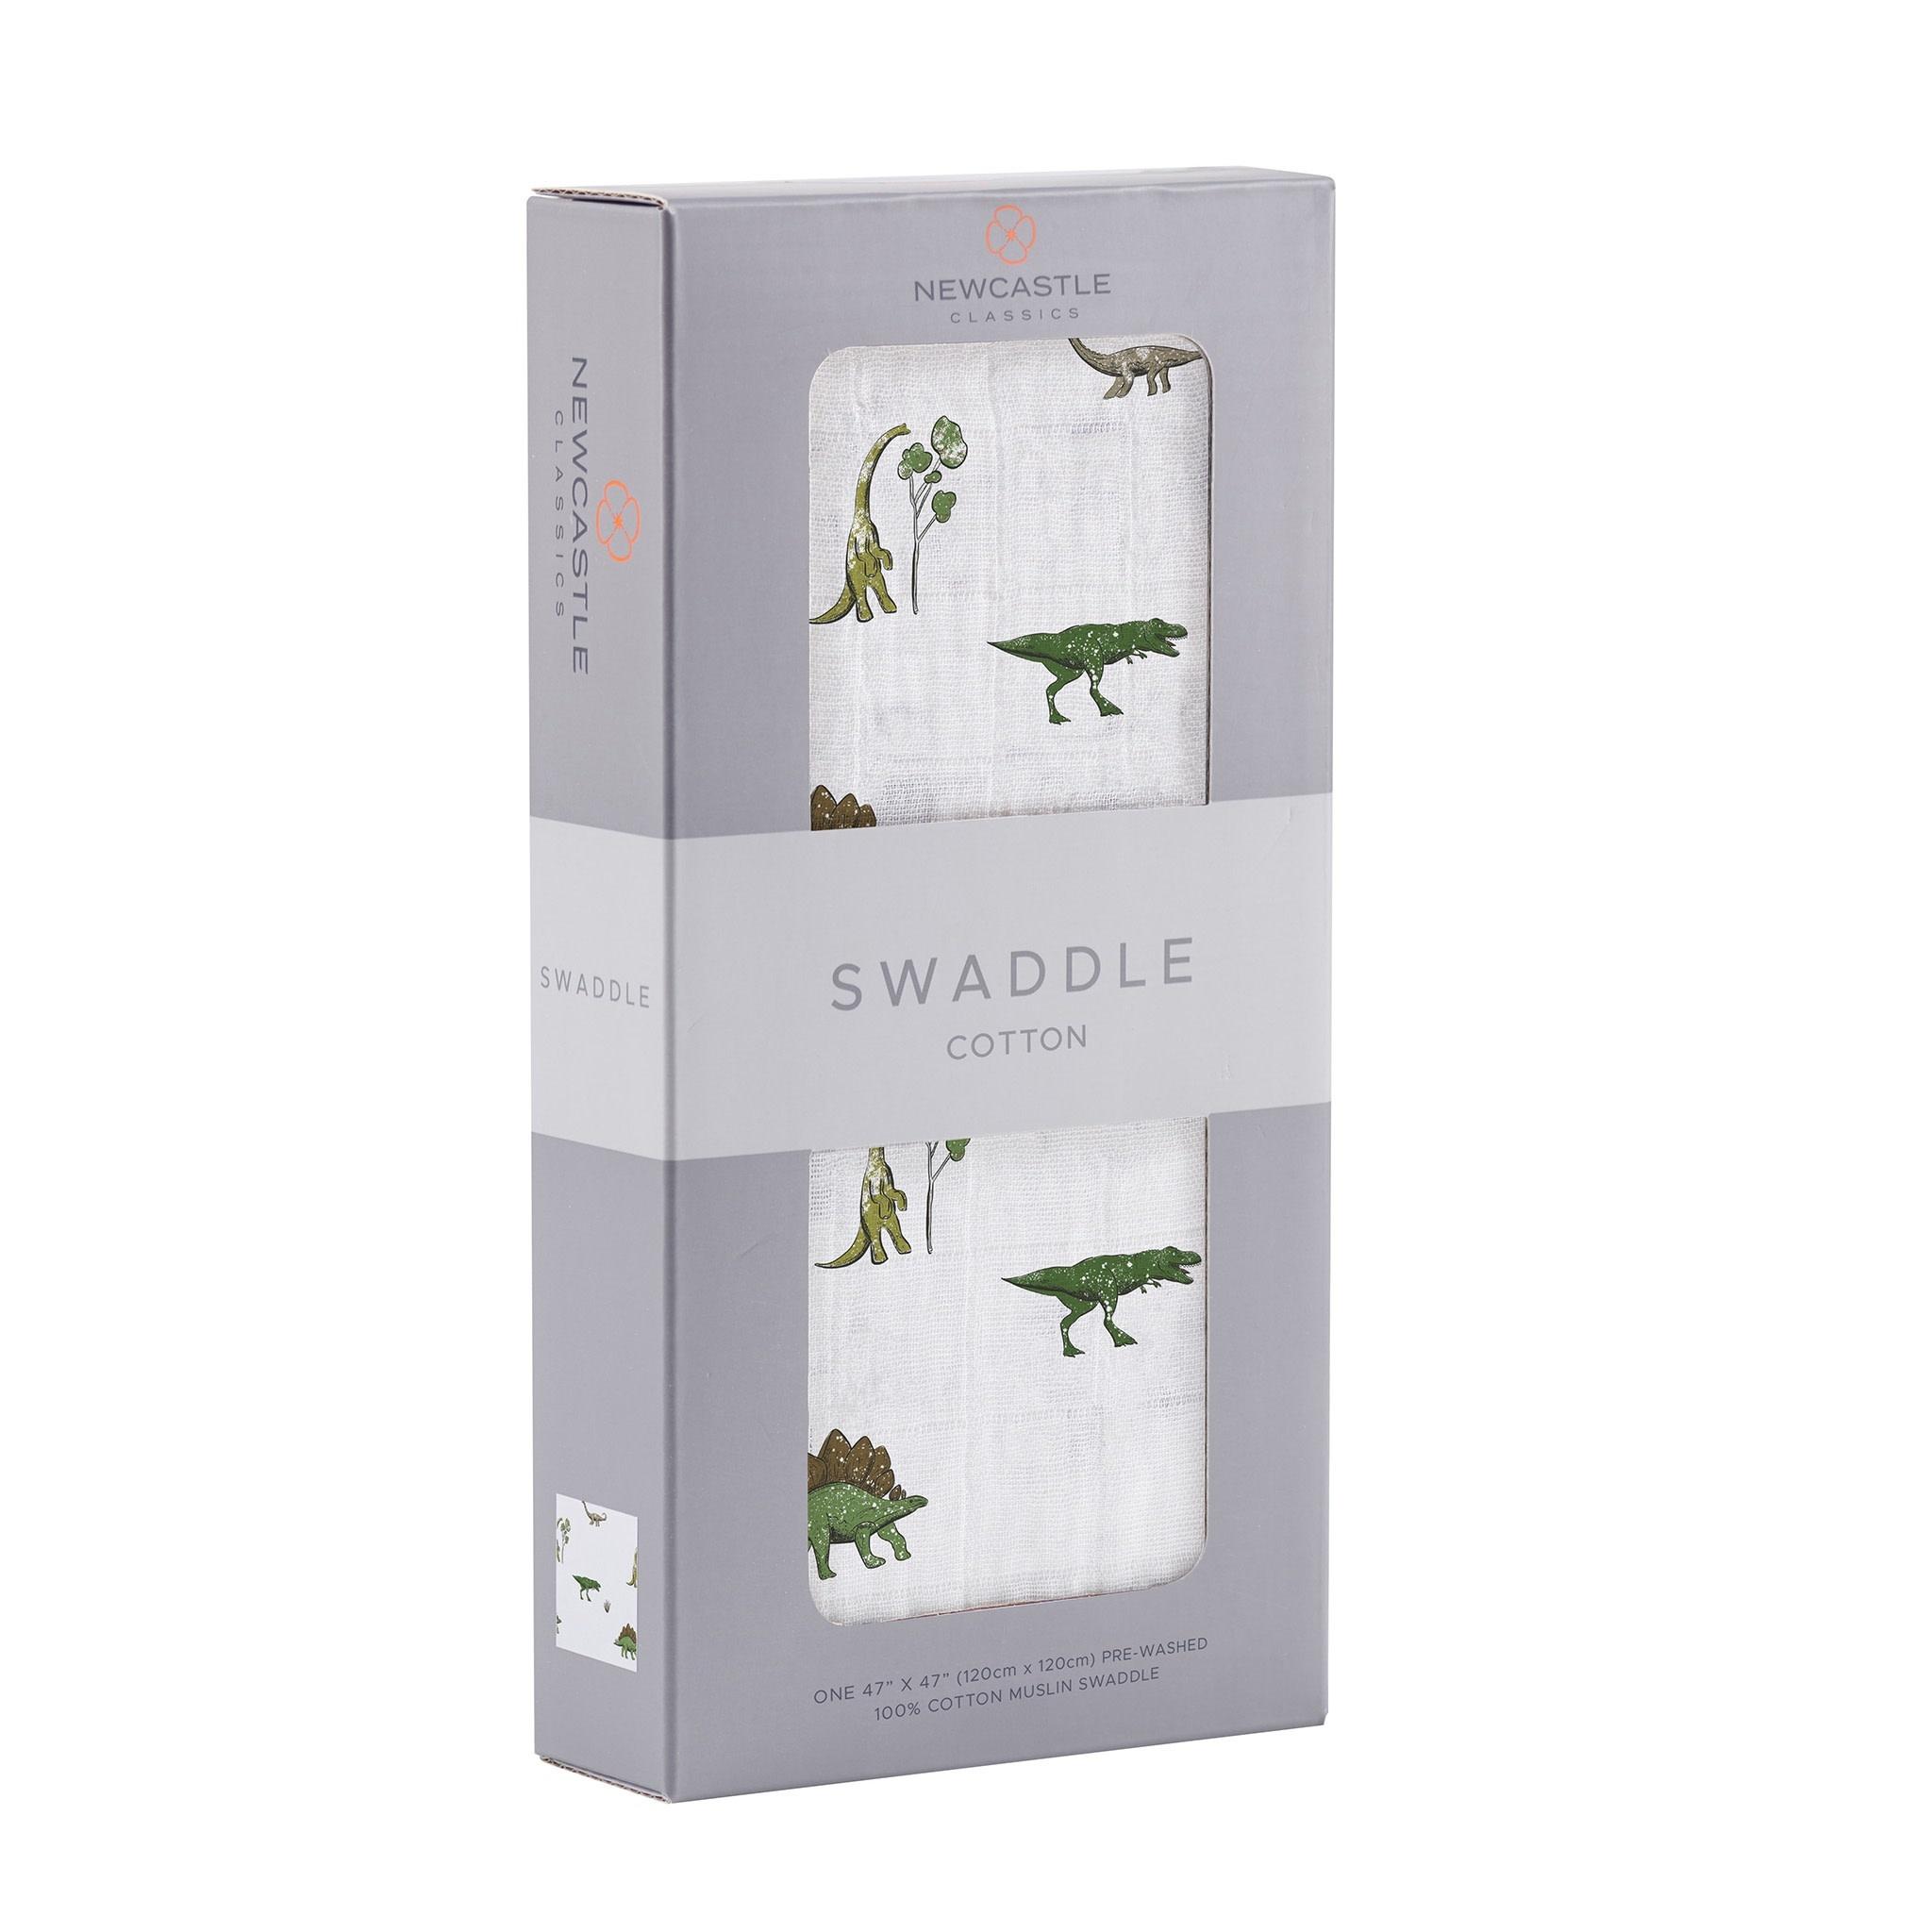 Newcastle Classics Newcastle Classics | Dino Days Swaddle